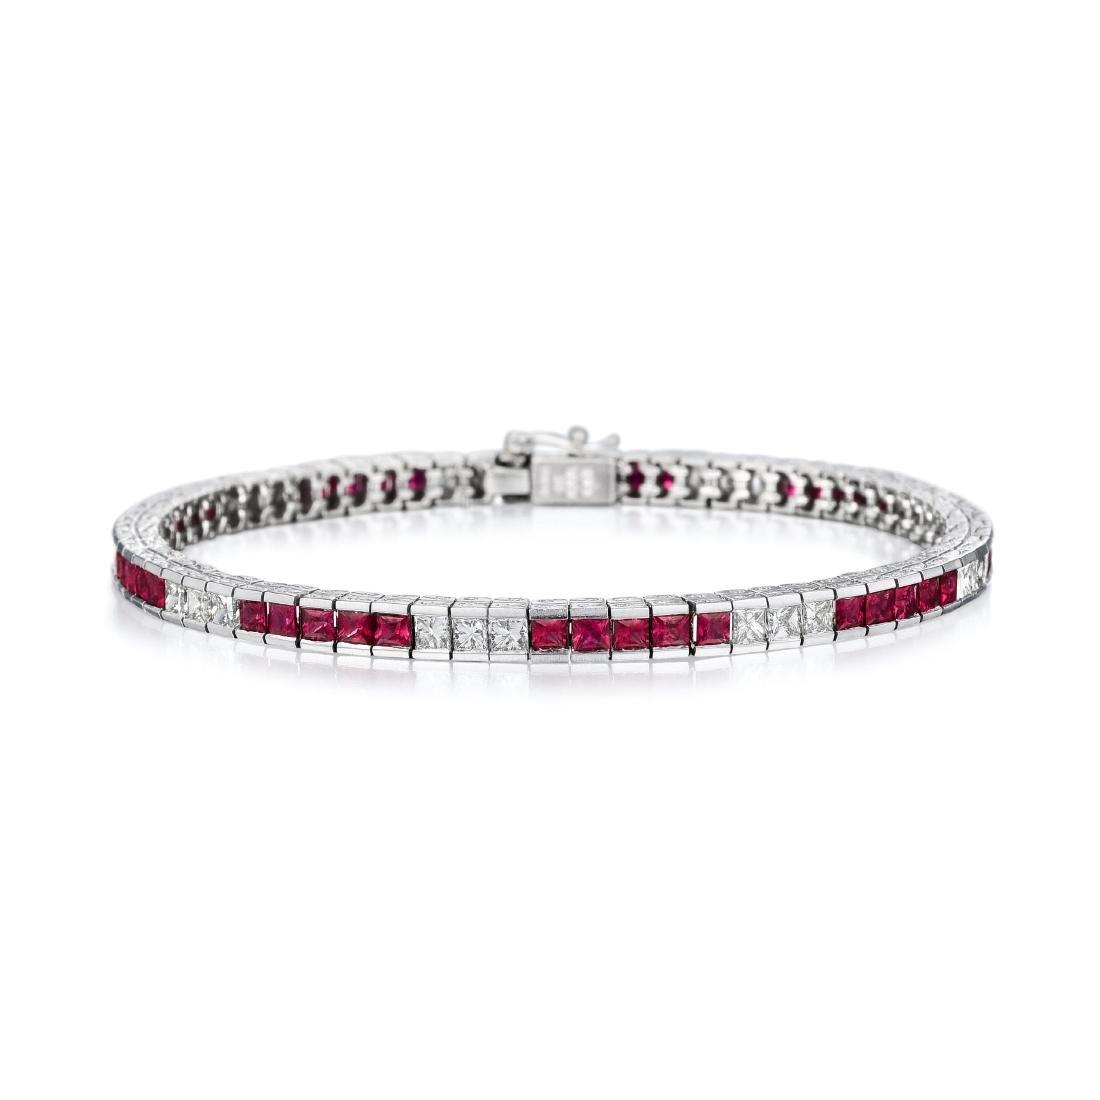 A Ruby and Diamond Bracelet